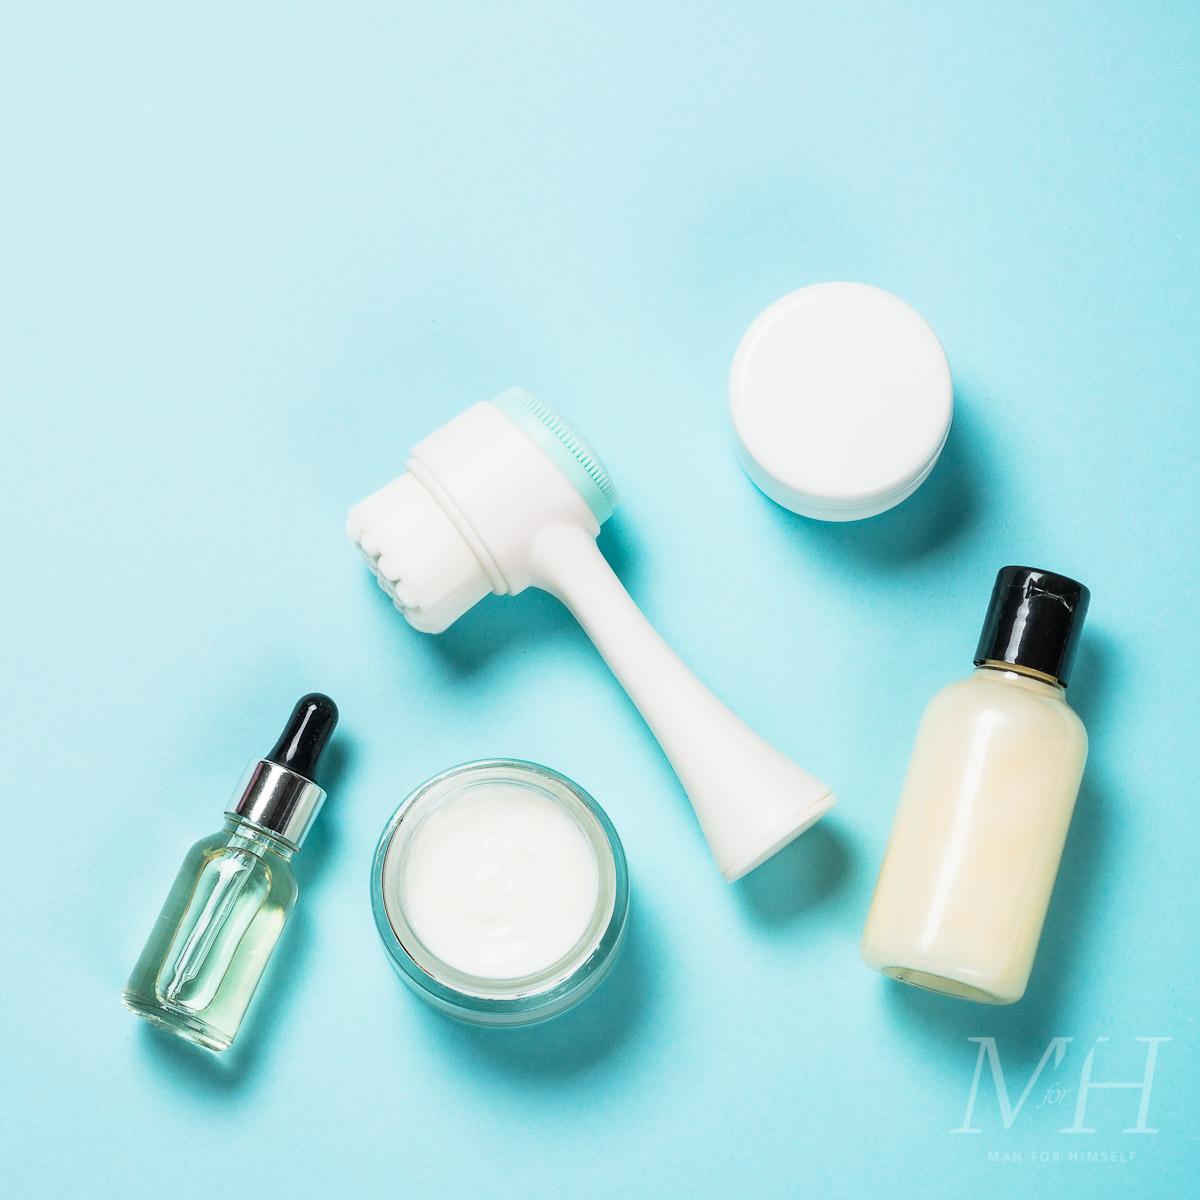 skin-care-products-moisturiser-serum-retinol-grooming-man-for-himself